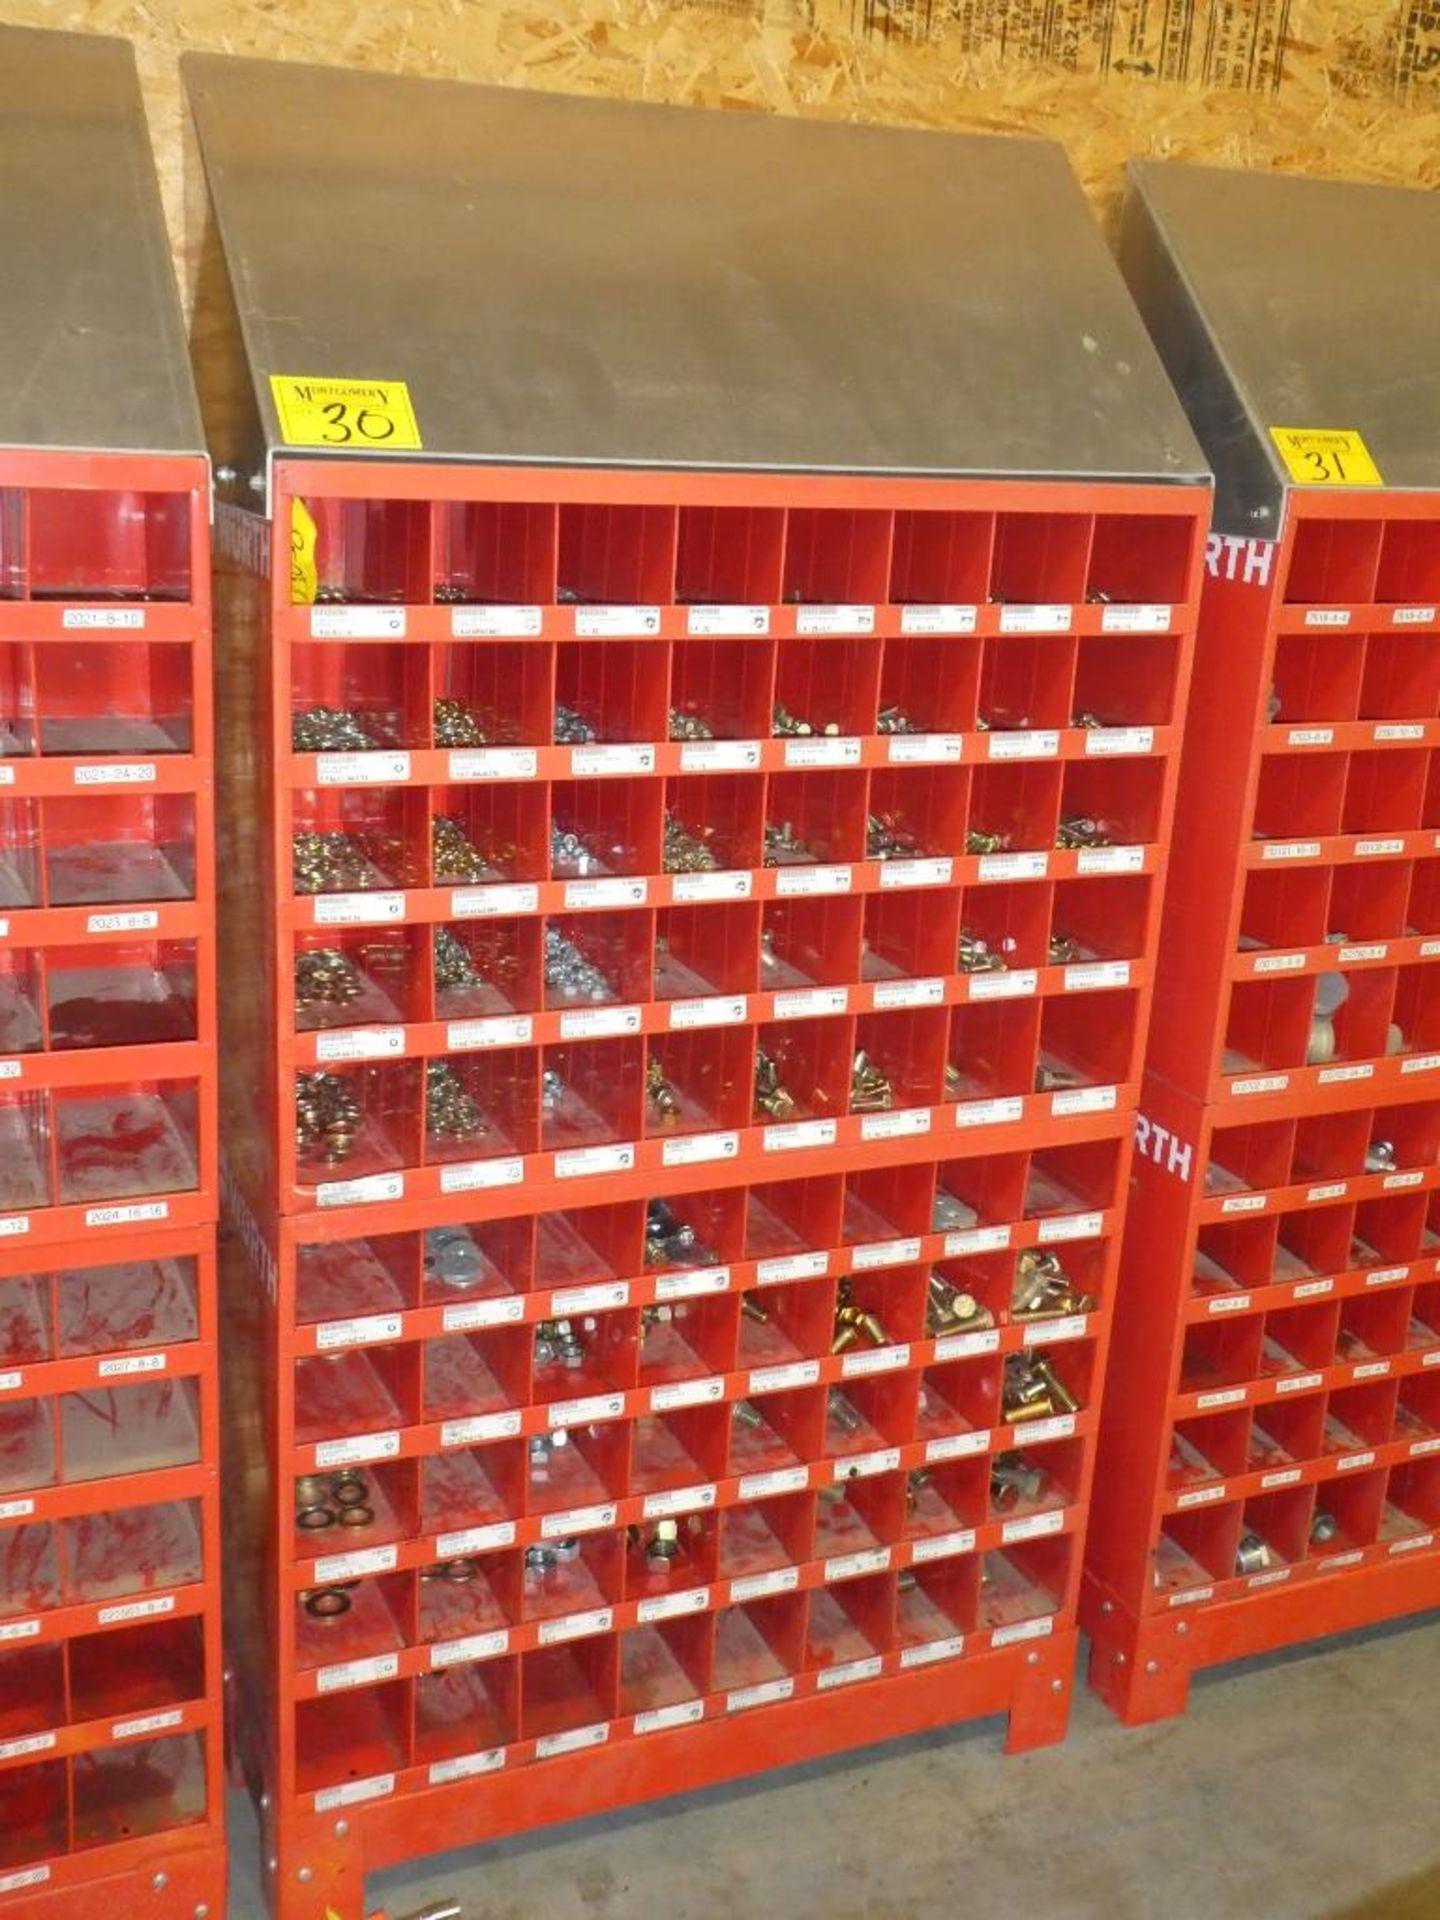 Lot 30 - 2-WURTH 40 COMPARTMENT BOLT BINS W/ STAND & GR. 8 HARDWARE SAE